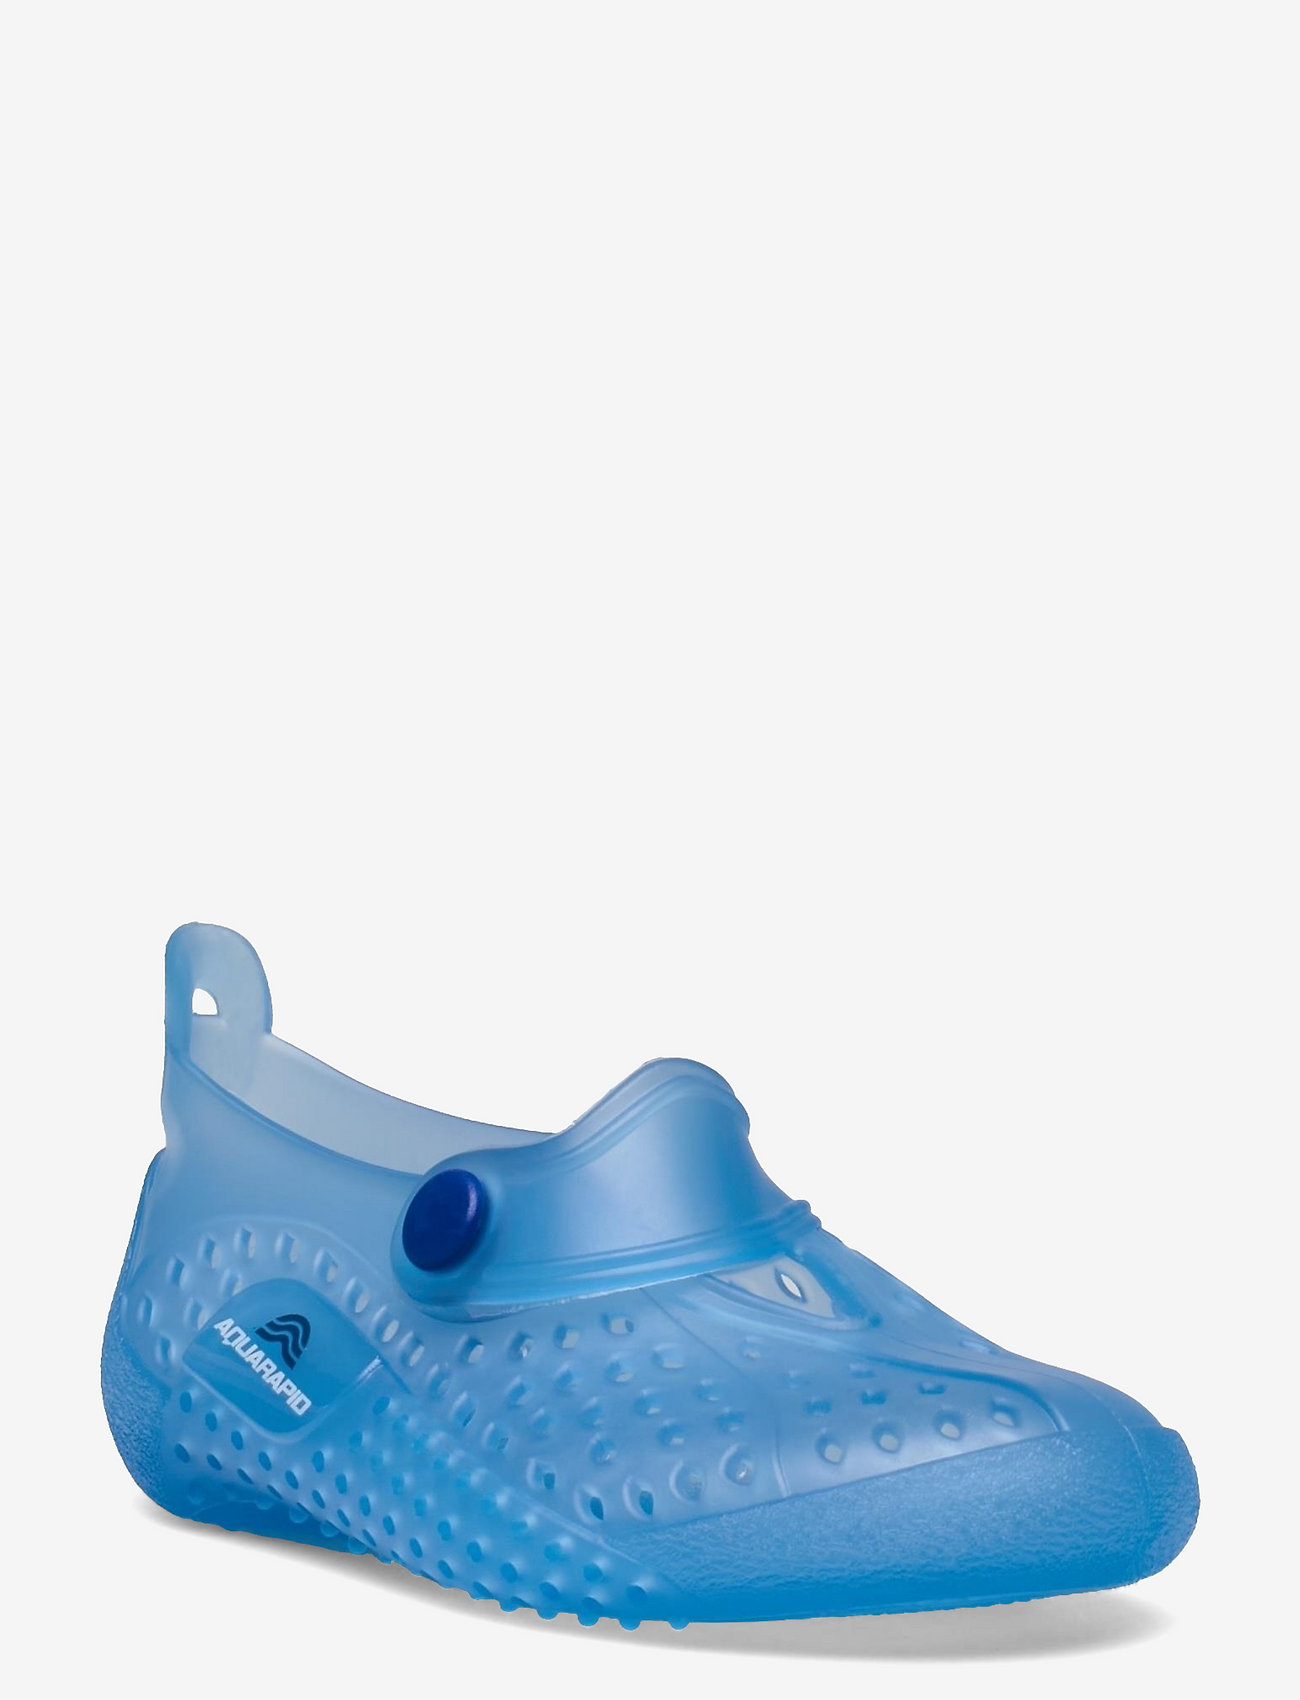 Aquarapid - Aquarapid Gal 23/24 - pool sliders - tuorquoise - 0